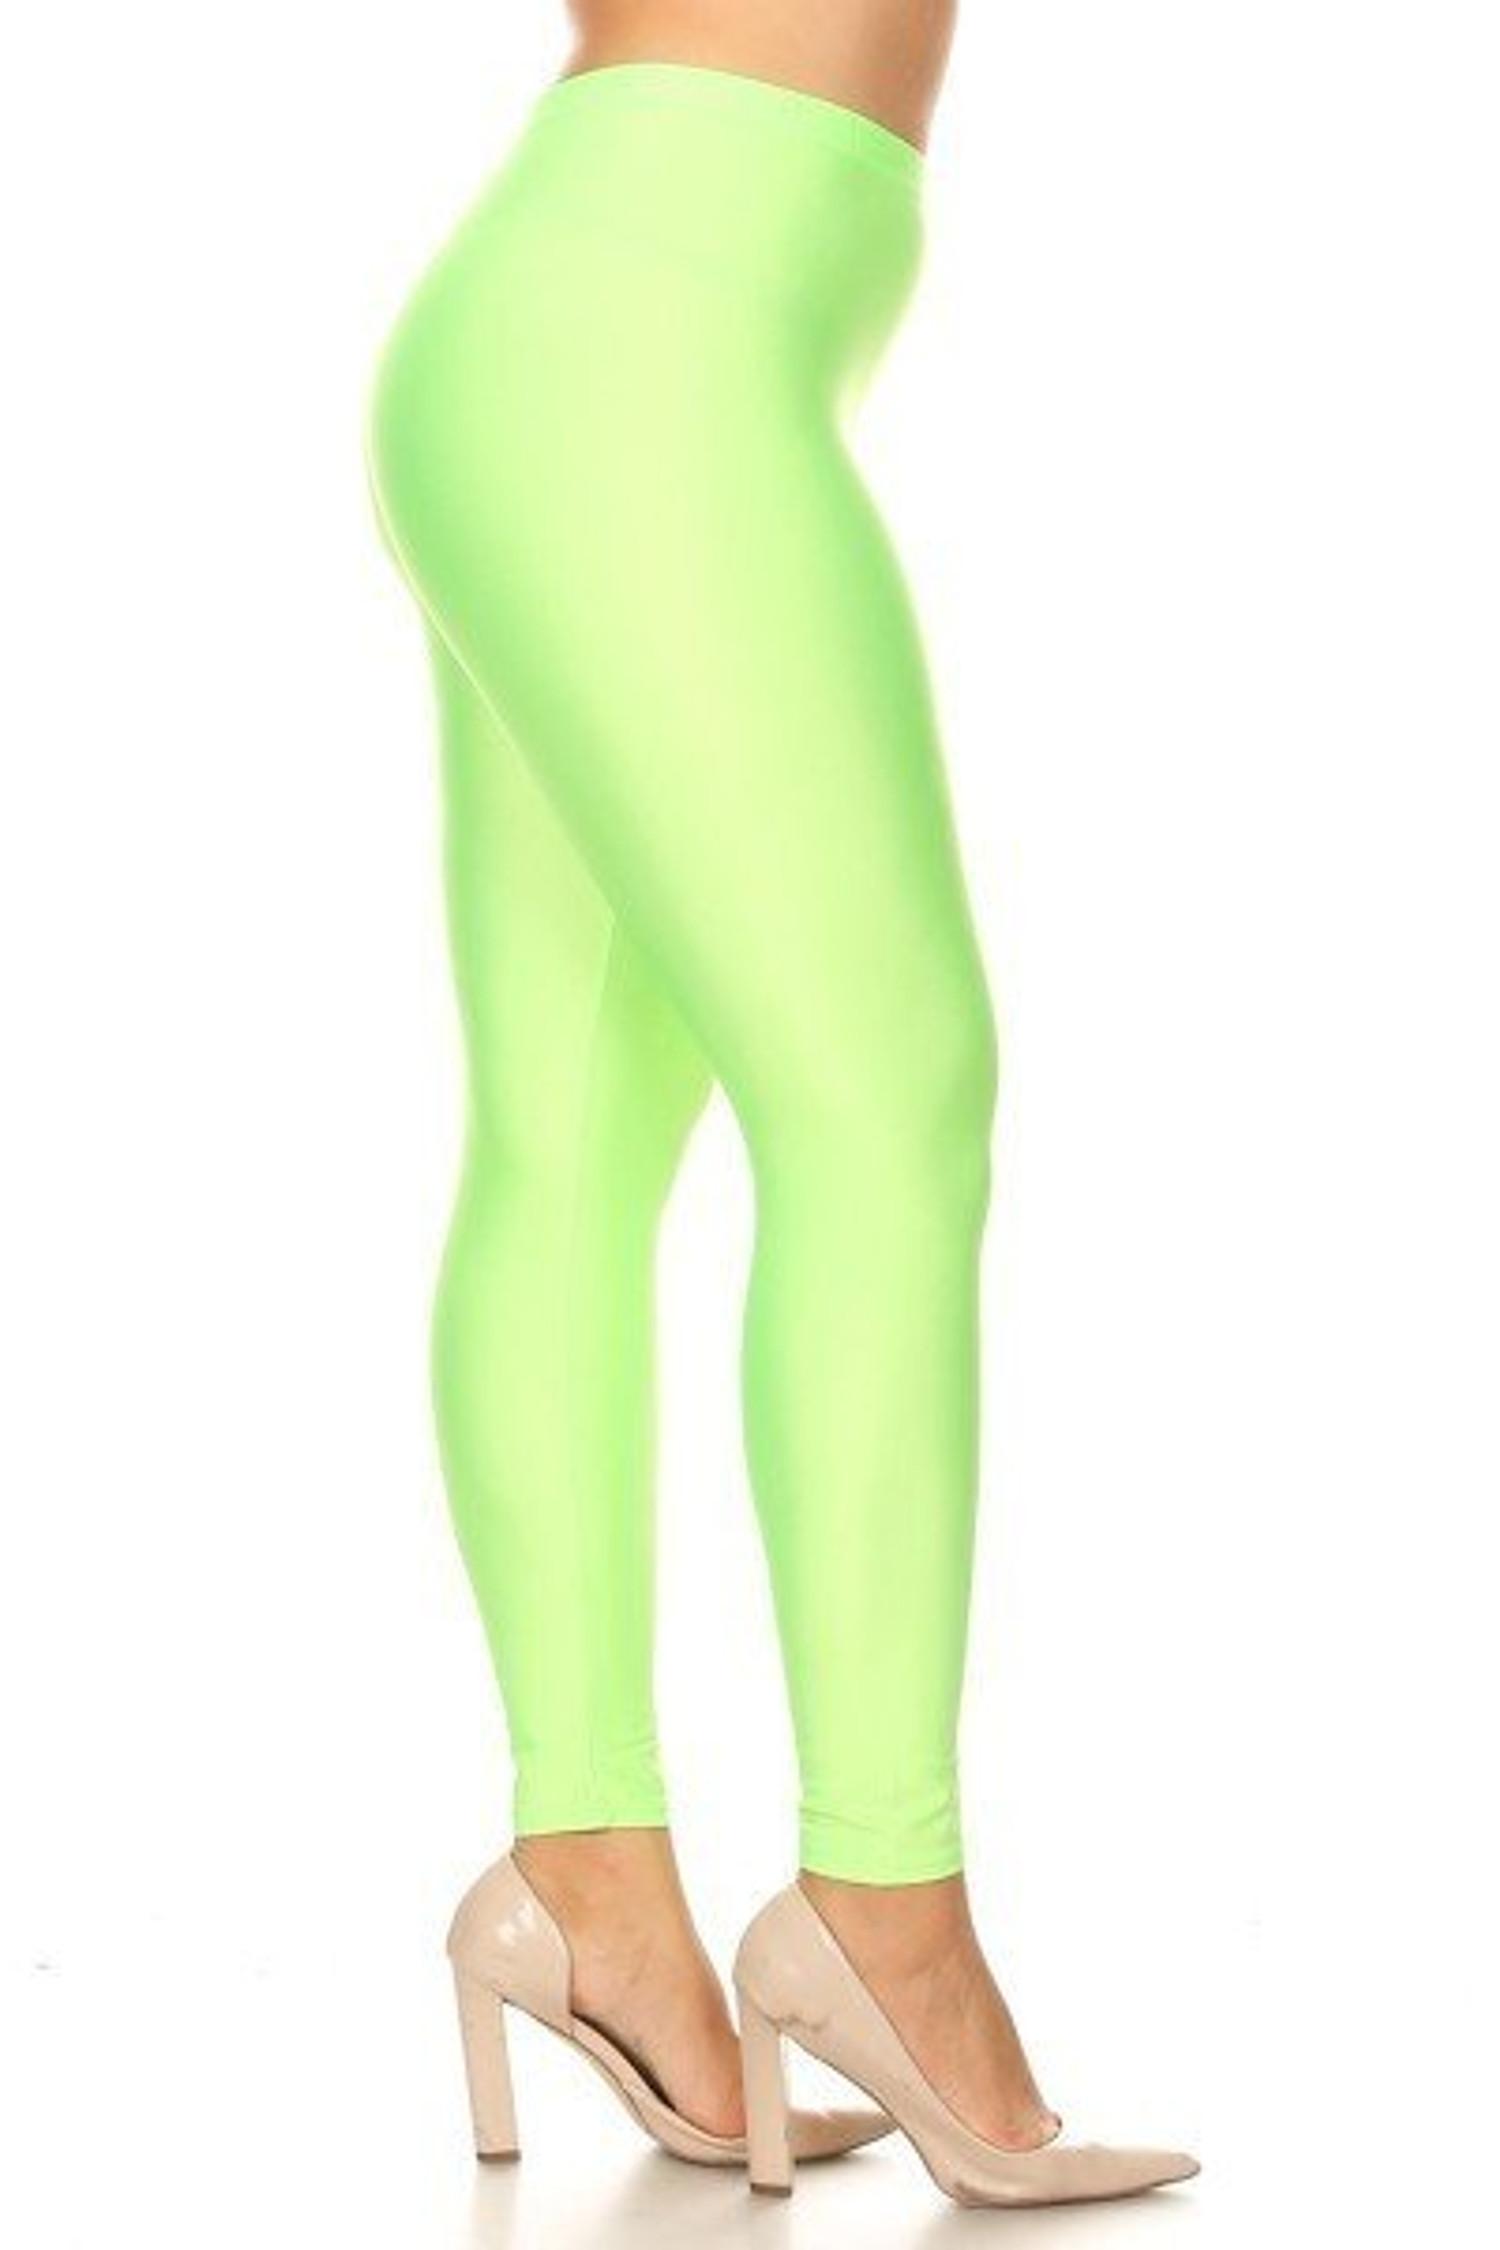 Neon Green Premium Shiny Stretch Plus Size Leggings